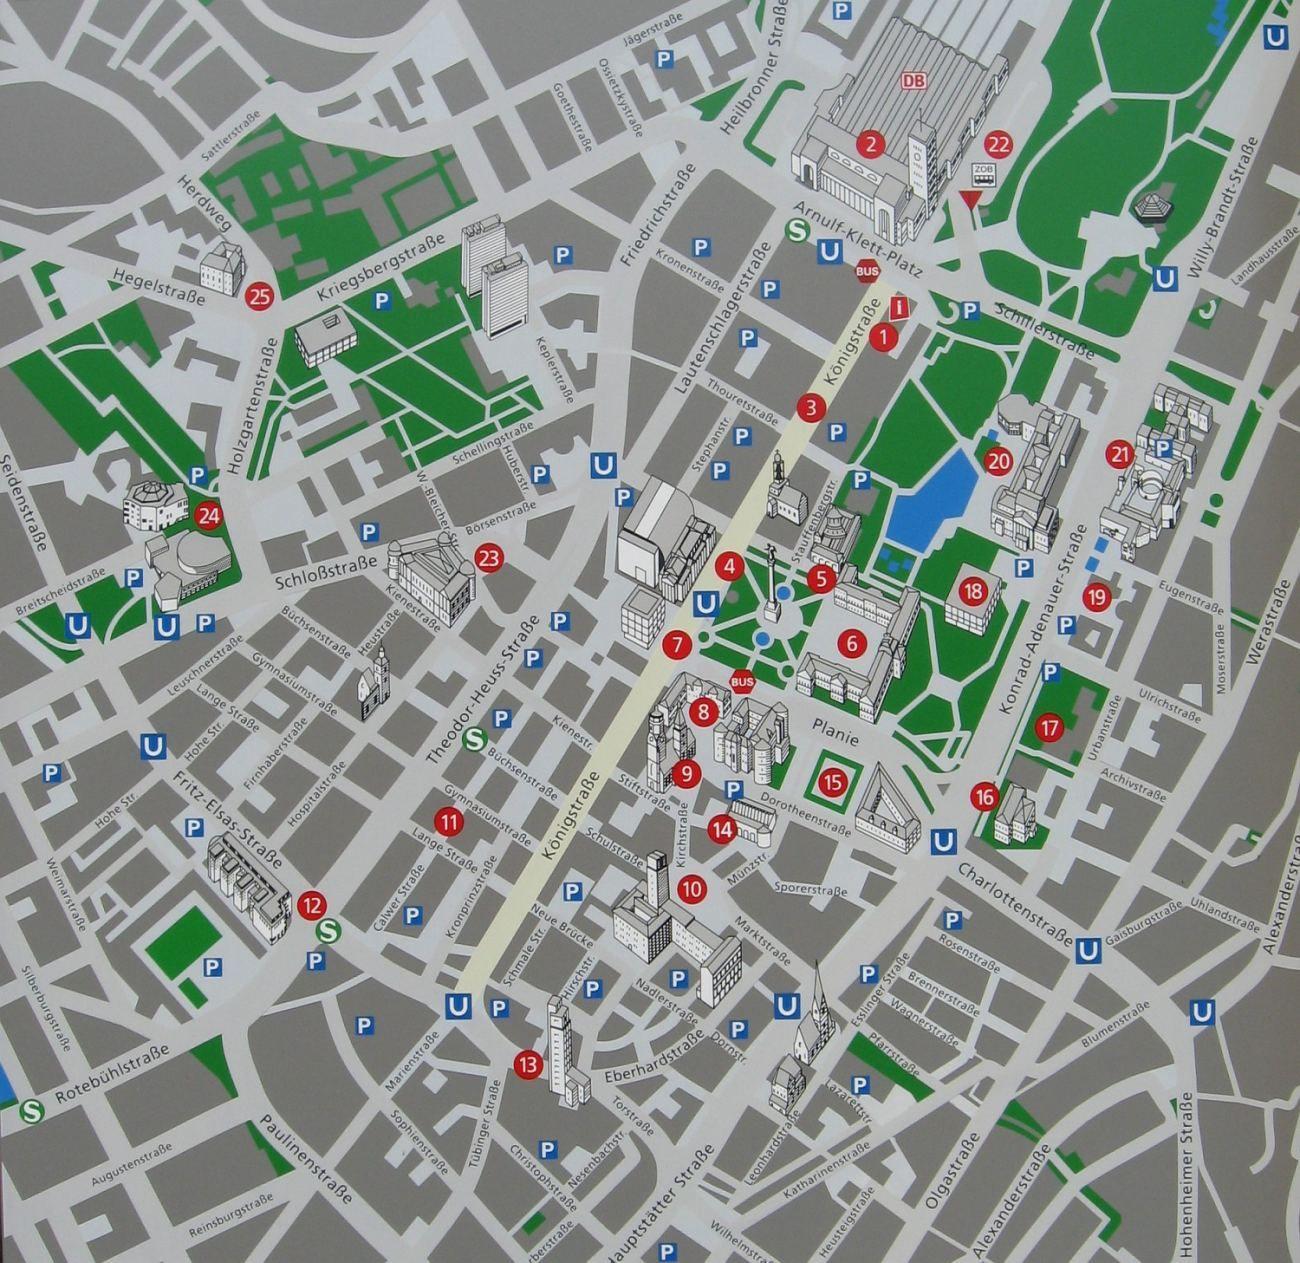 Cartina Germania Stoccarda.Mappa Di Stoccarda Cartina D Stoccarda Stoccarda Stoccarda E